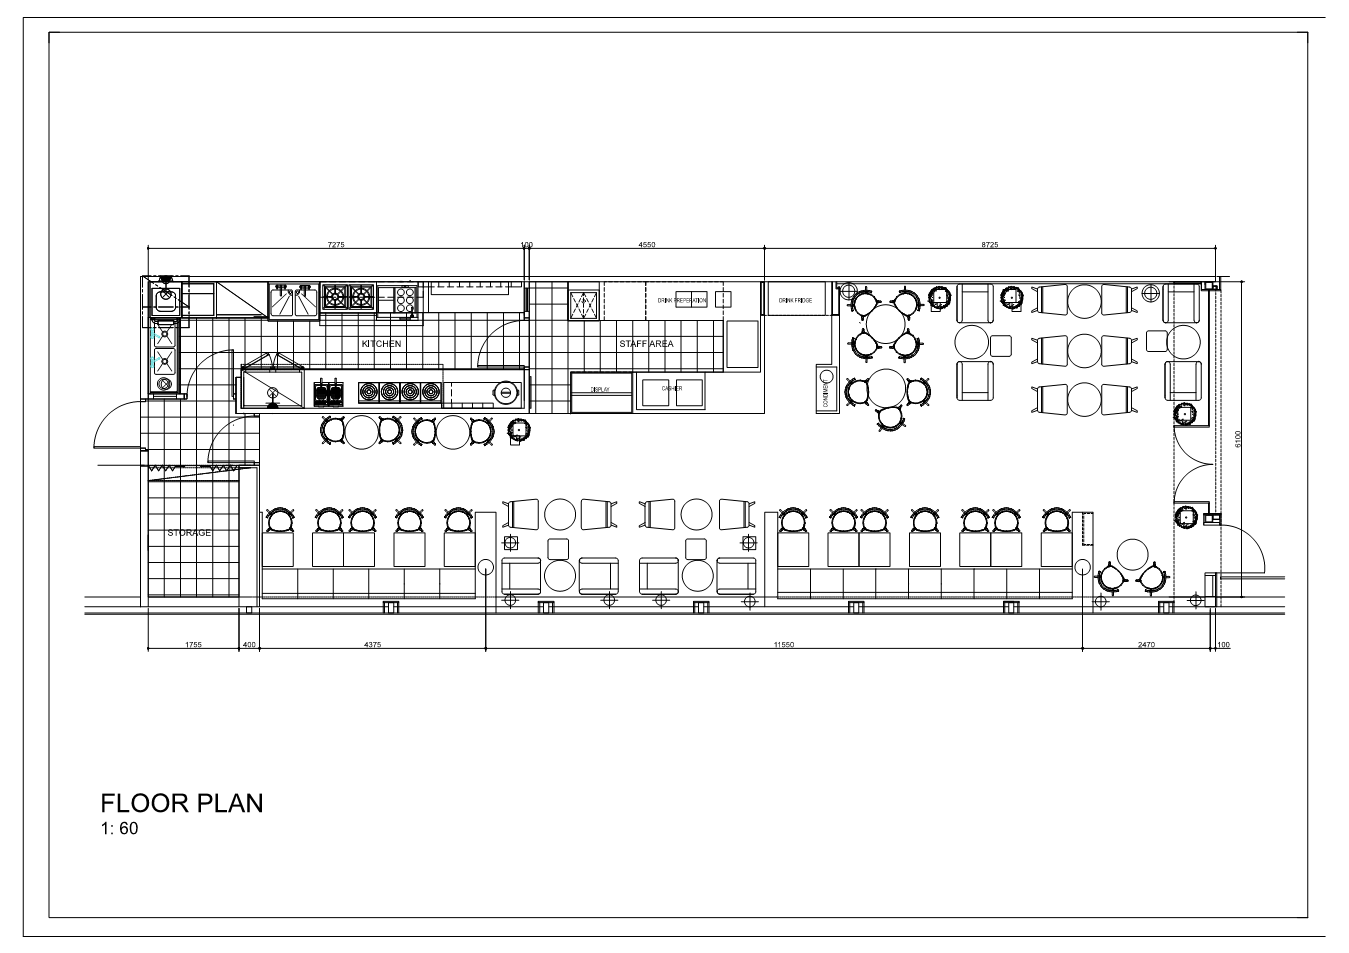 Restaurant kitchen floor plan for Commercial kitchen floor plan